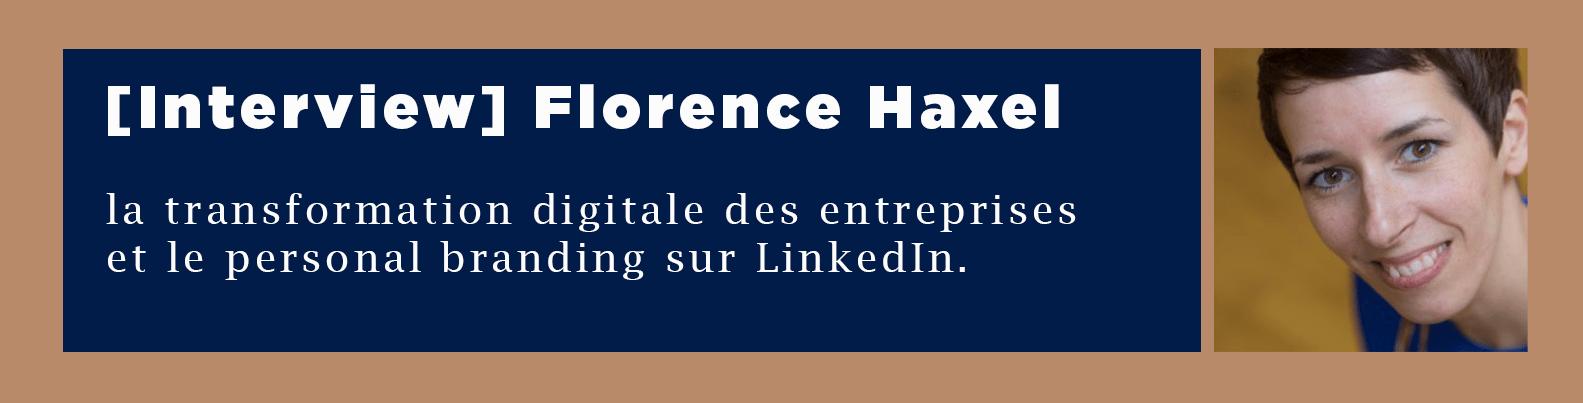 Interview de Florence Haxel